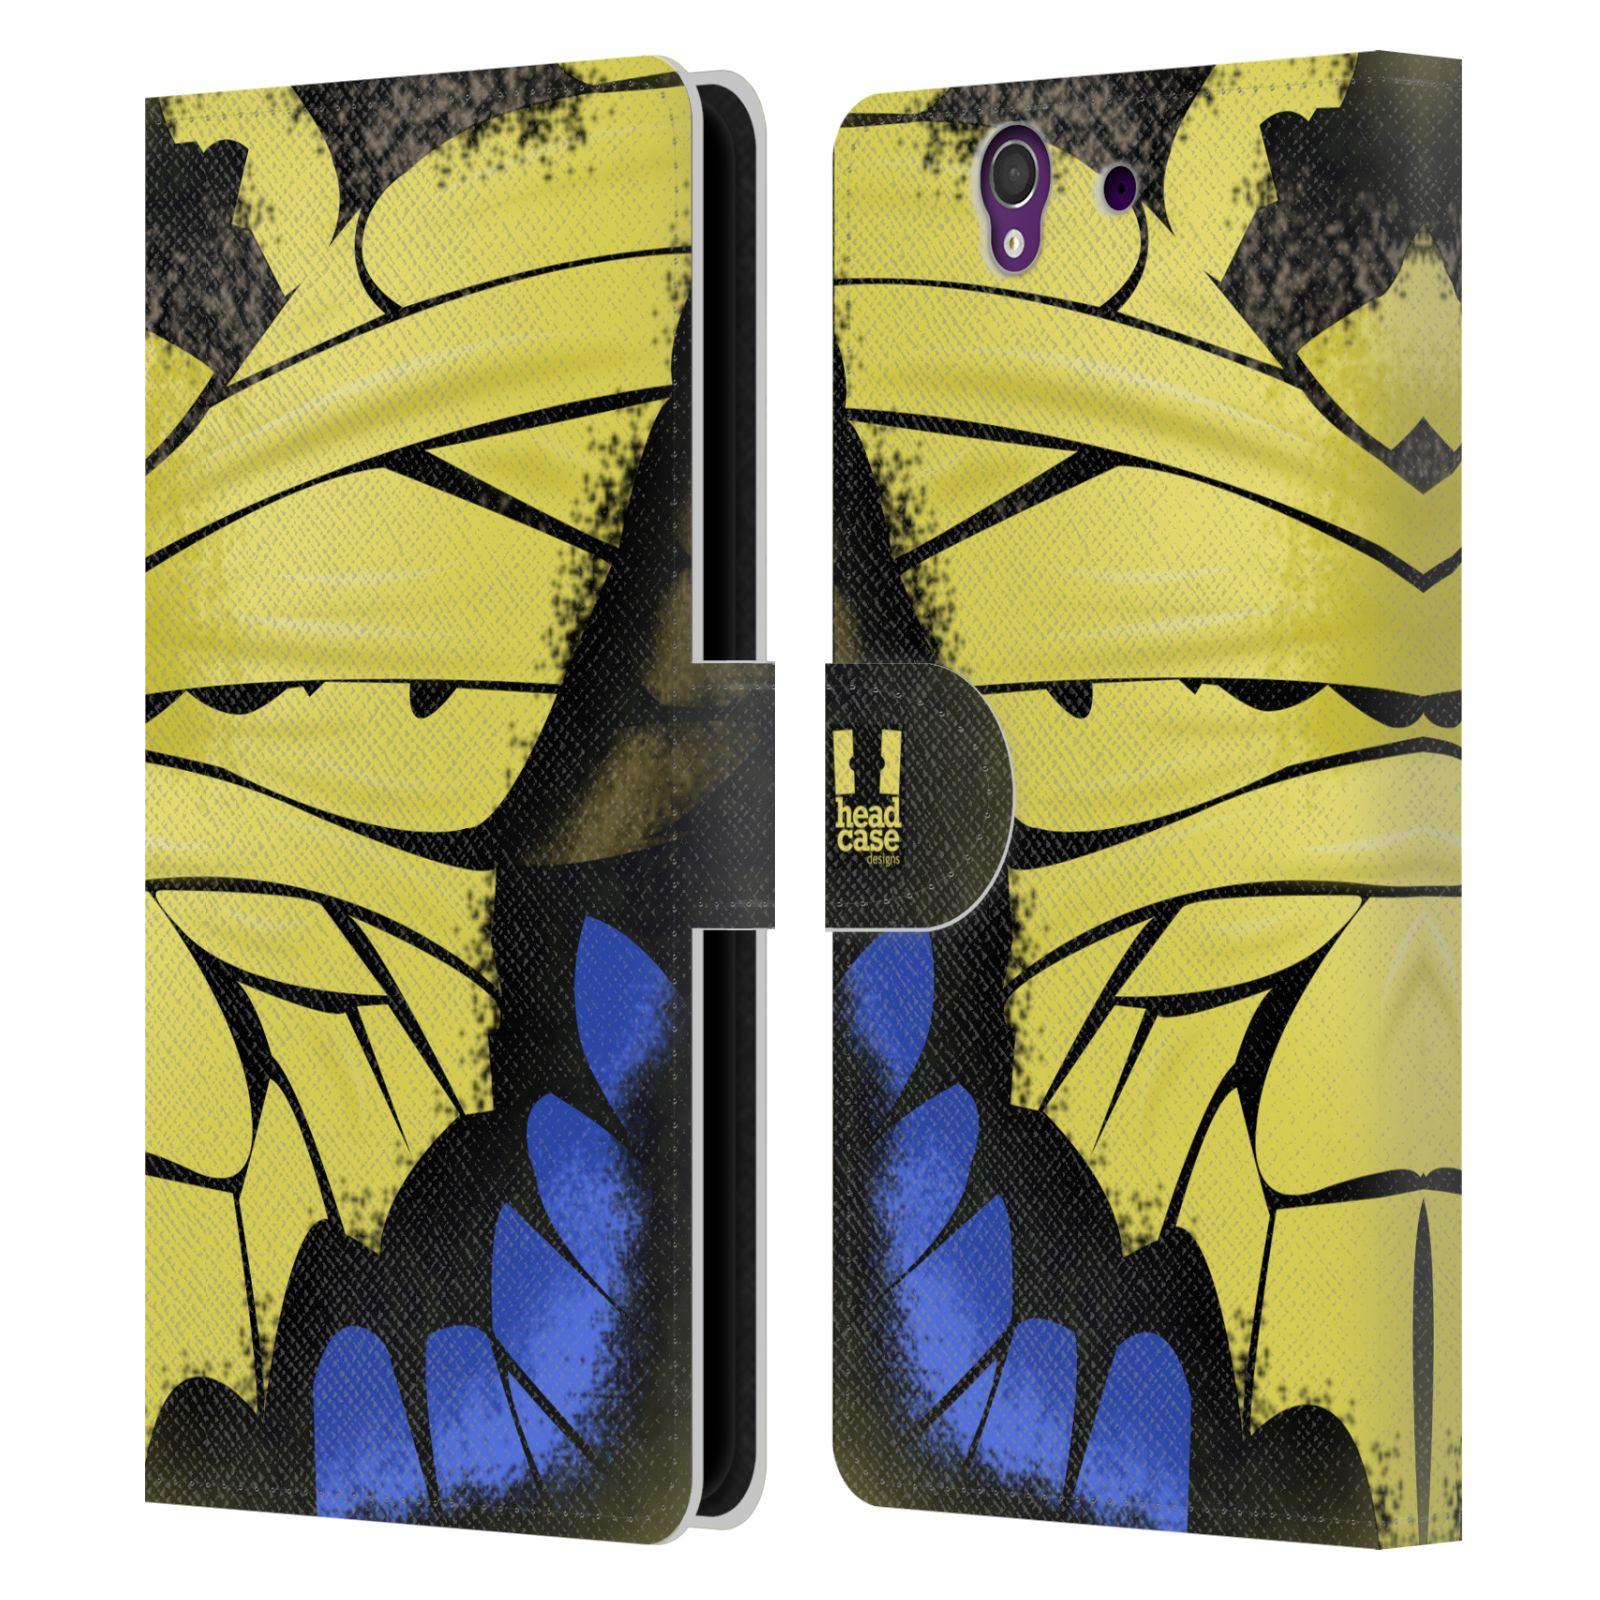 HEAD CASE Flipové pouzdro pro mobil SONY XPERIA Z (C6603) motýl a křídla kreslený vzor žlutá a modrá